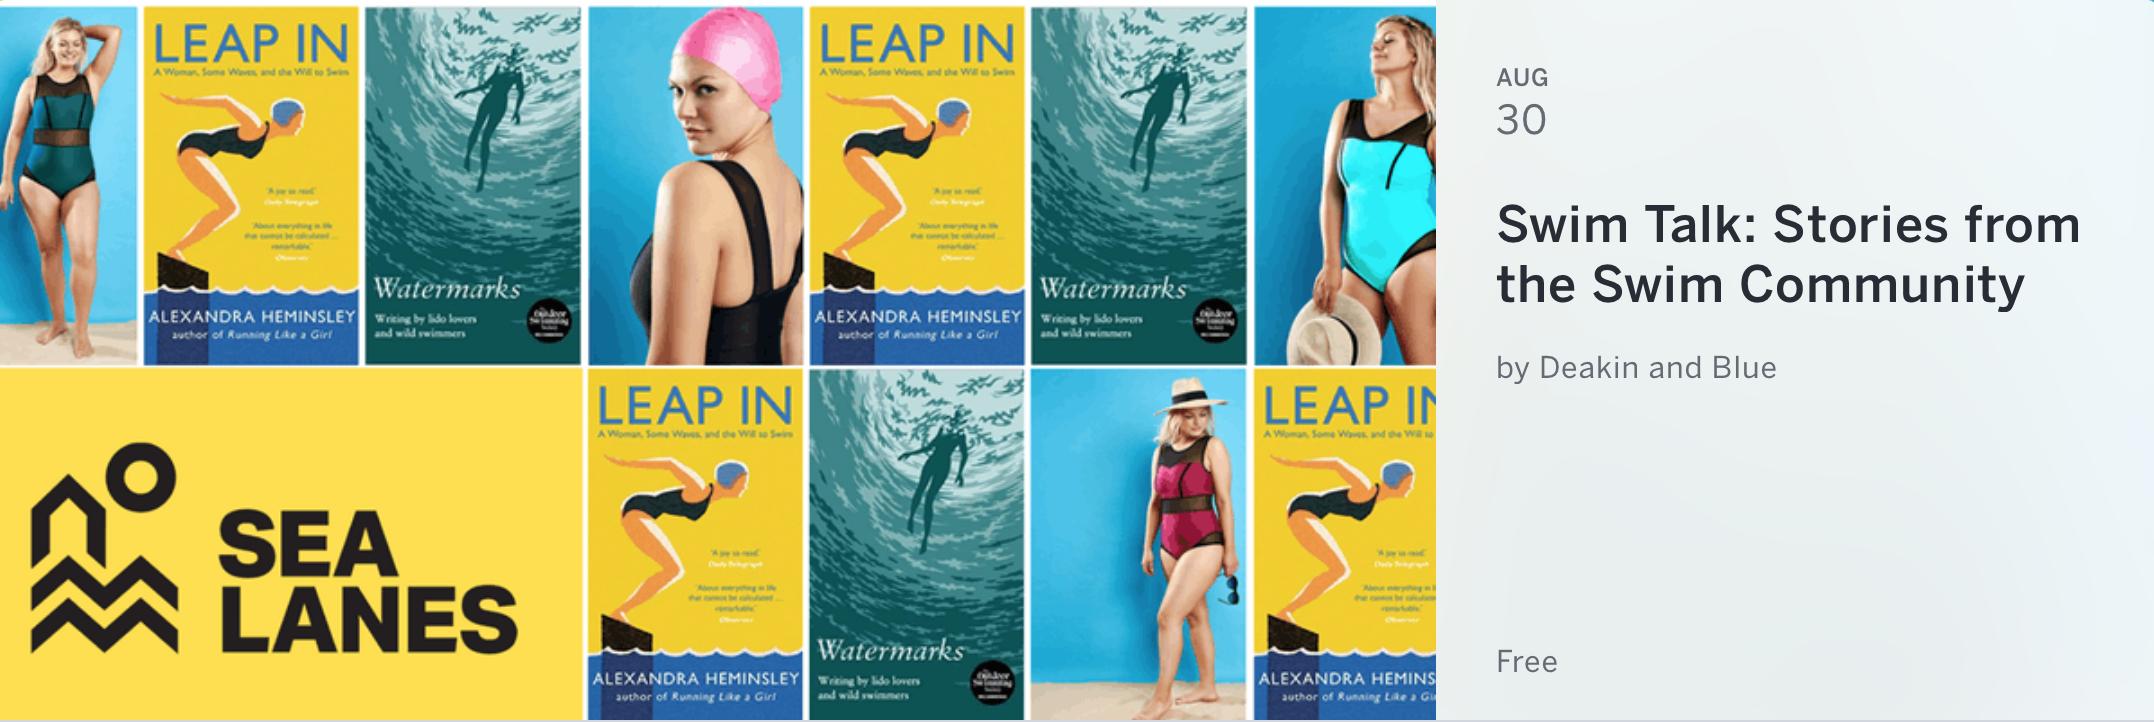 Swim Talk at Sea Lanes